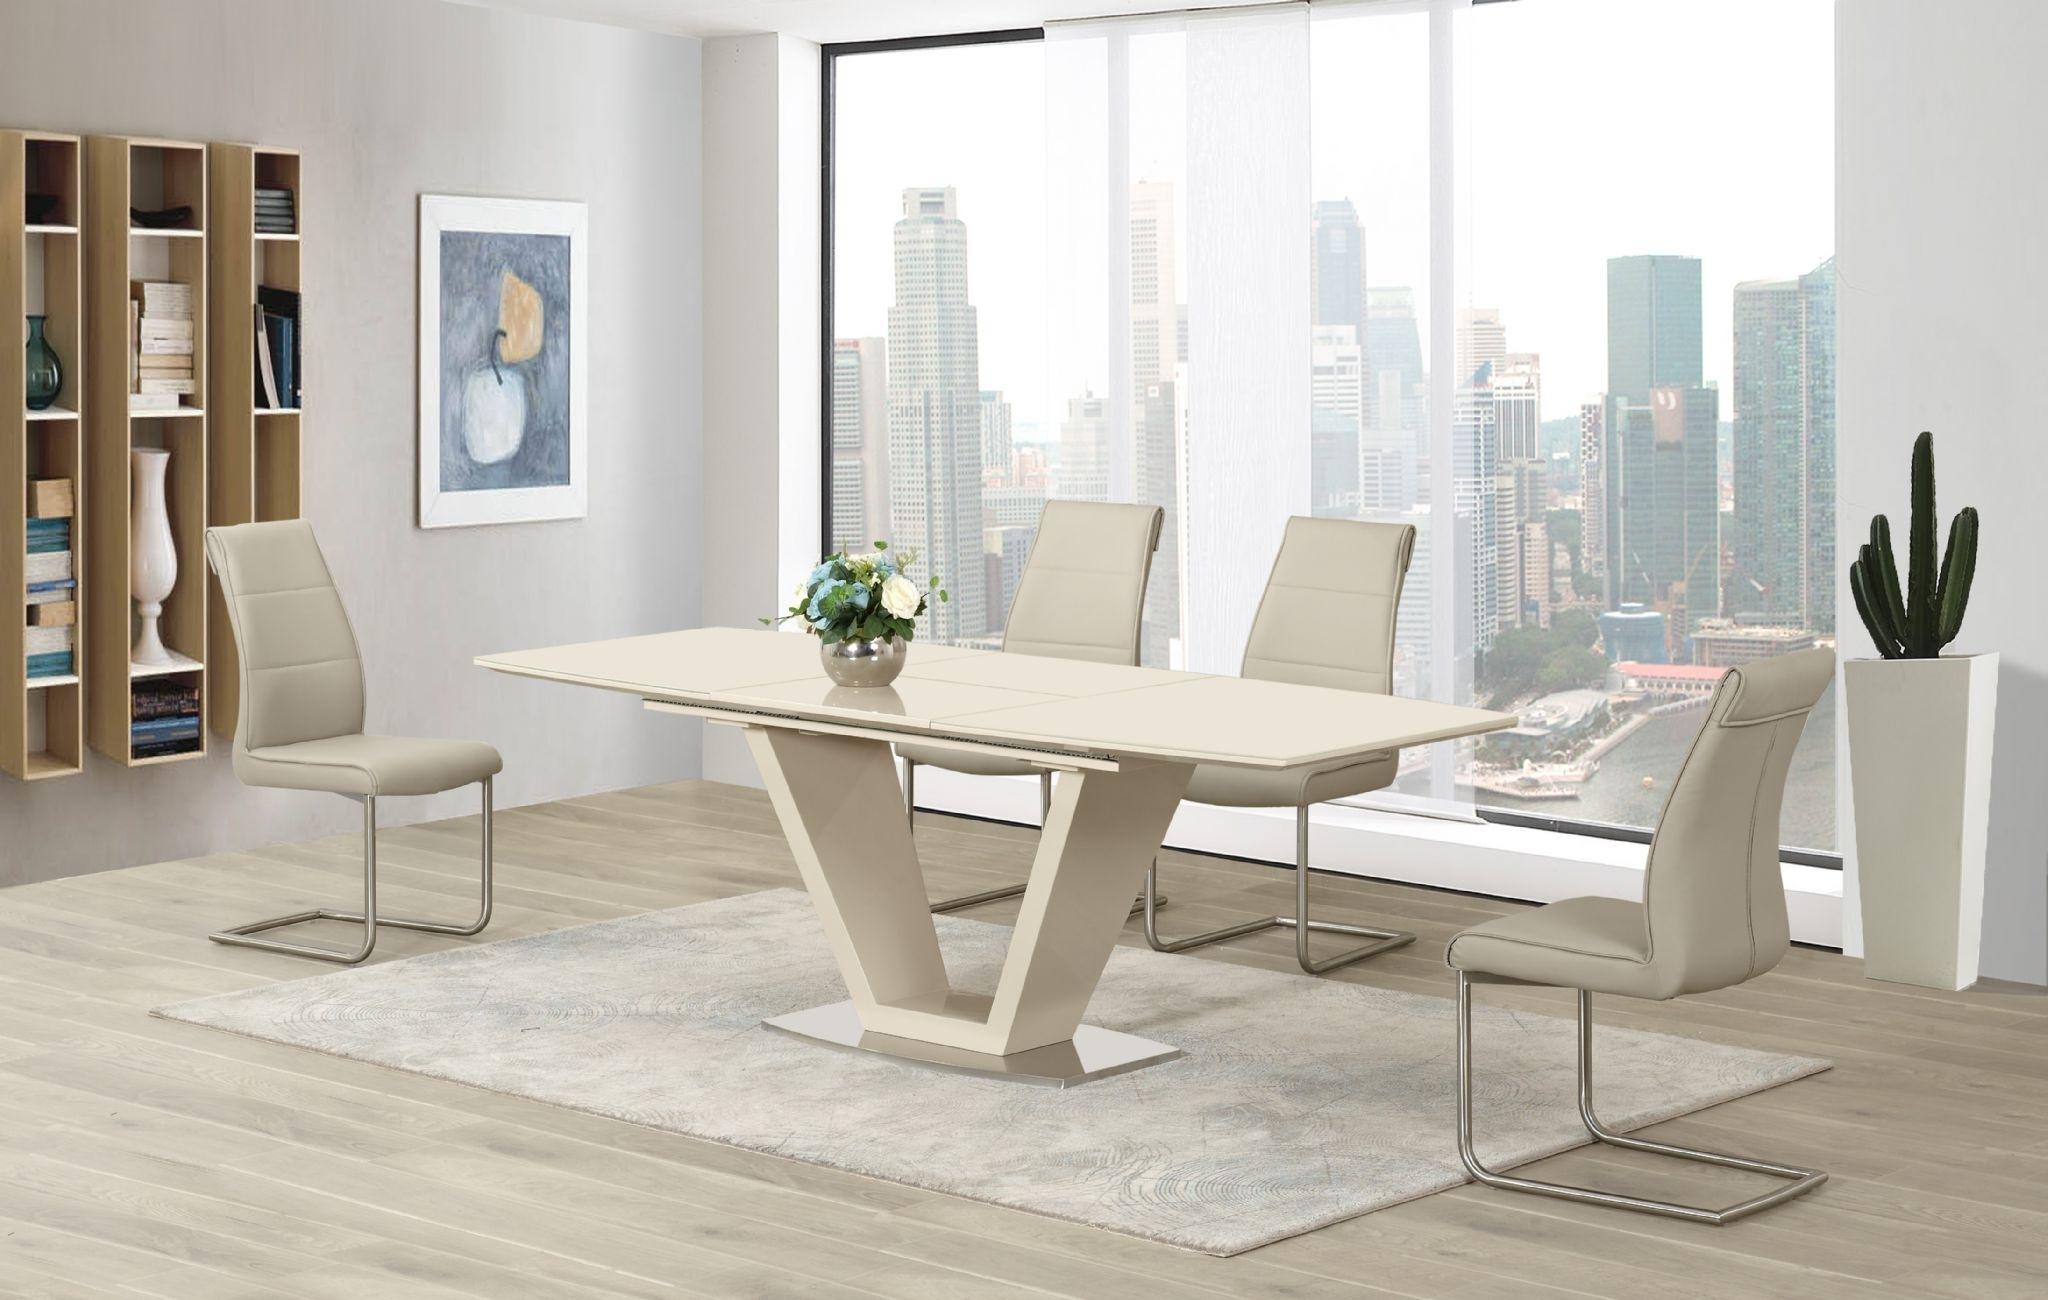 Famous Ga Loriga Cream Gloss Glass Designer Dining Table Extending 160 220 Regarding Large White Gloss Dining Tables (View 9 of 25)